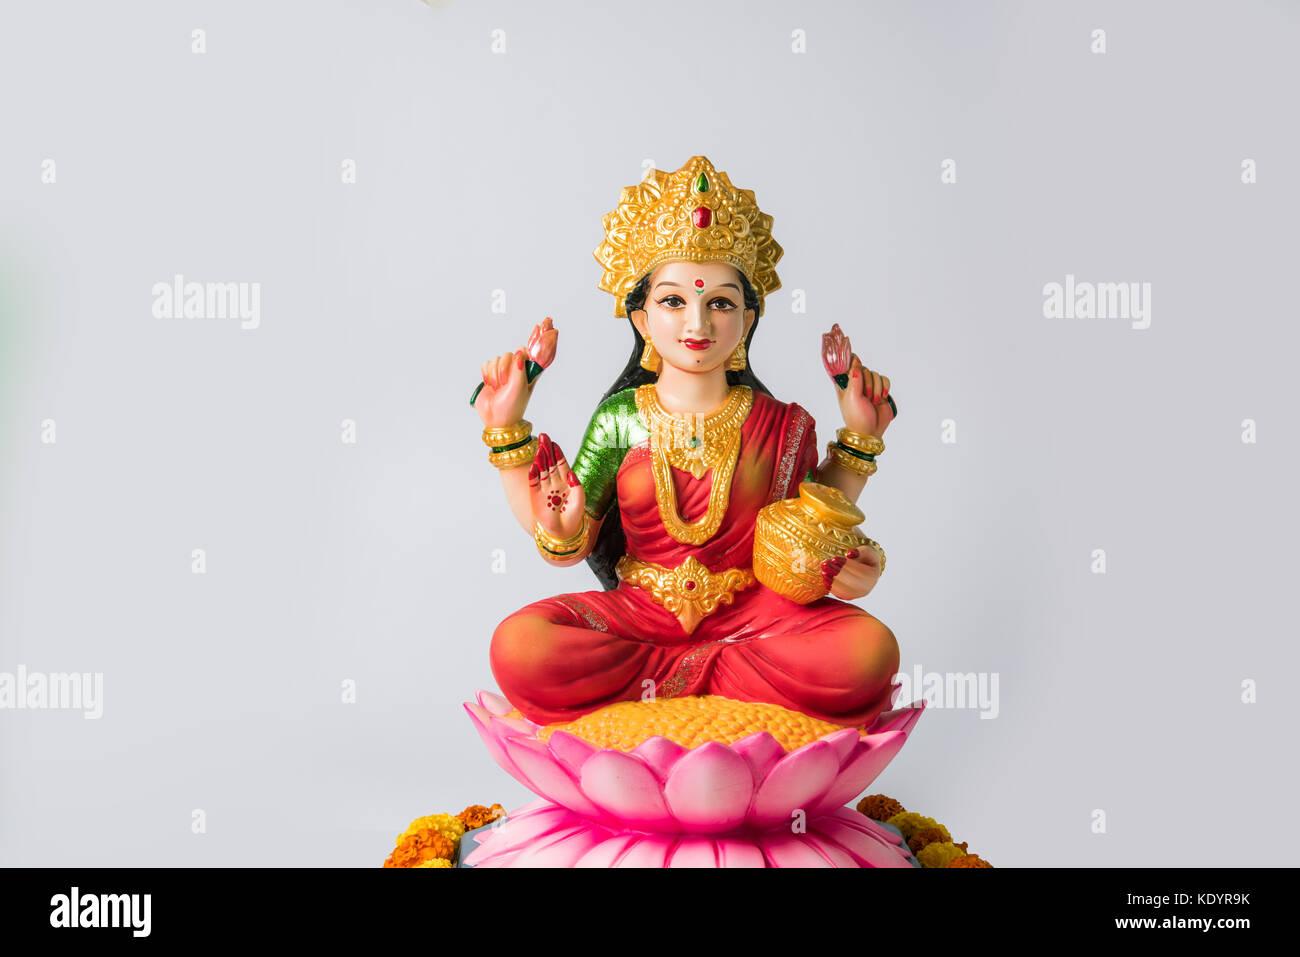 Lakshmi Idol Stock Photos & Lakshmi Idol Stock Images - Alamy